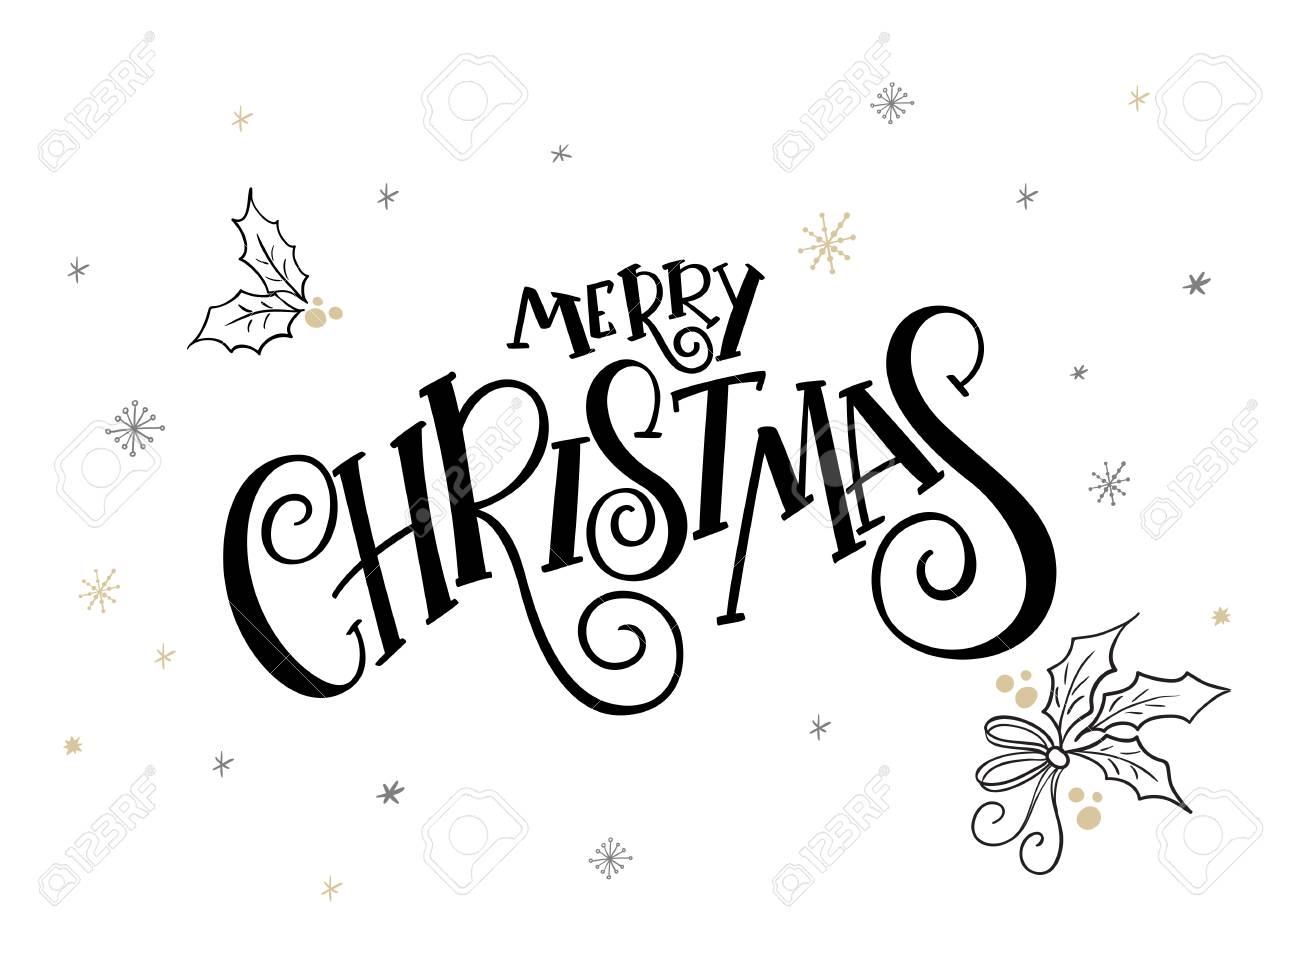 Text Weihnachtsgrüße.Stock Photo